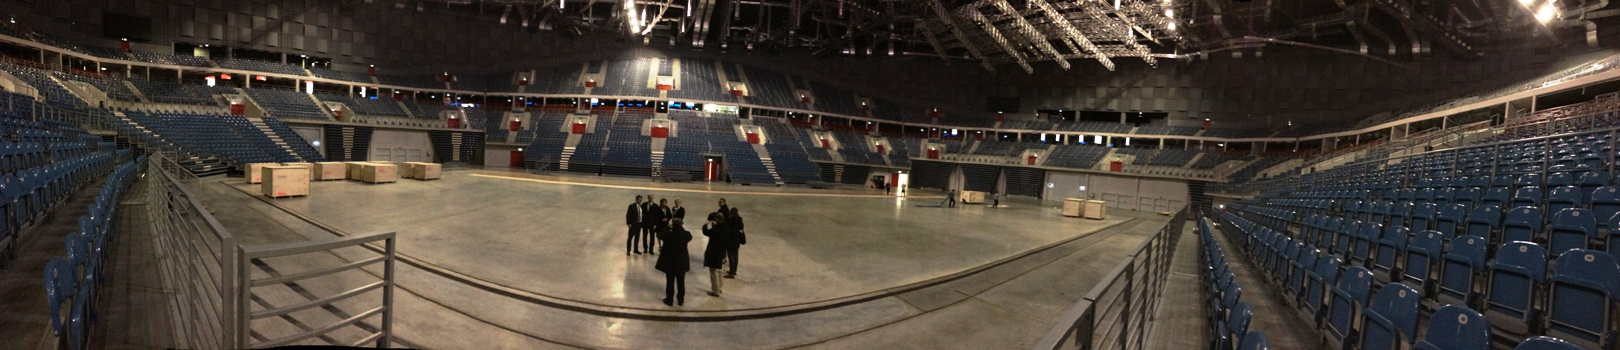 krakko arena panorama